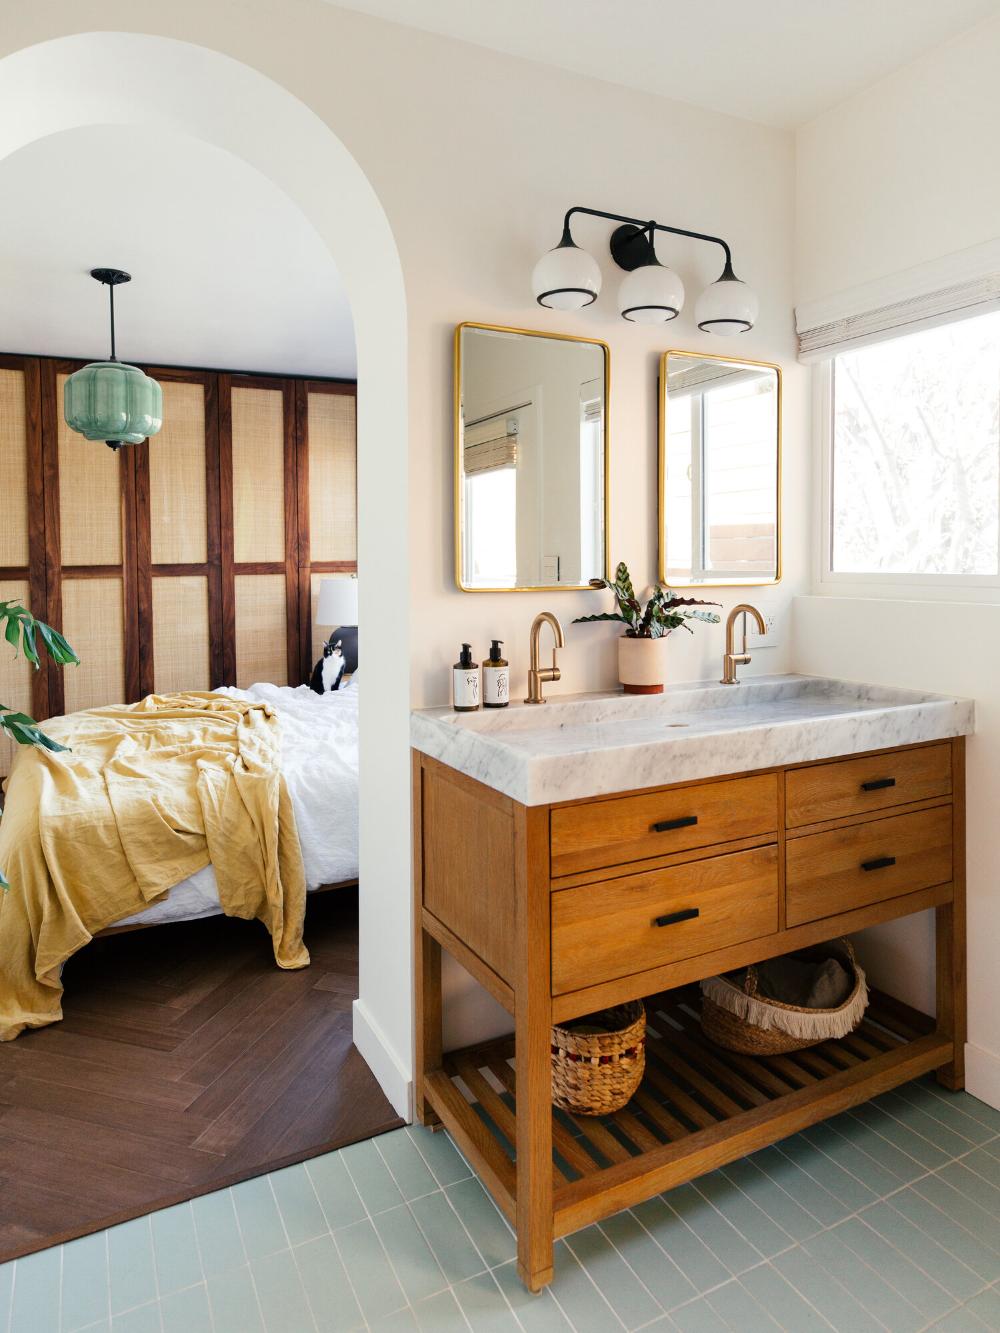 31+ Bedroom and bathroom flooring info cpns terbaru